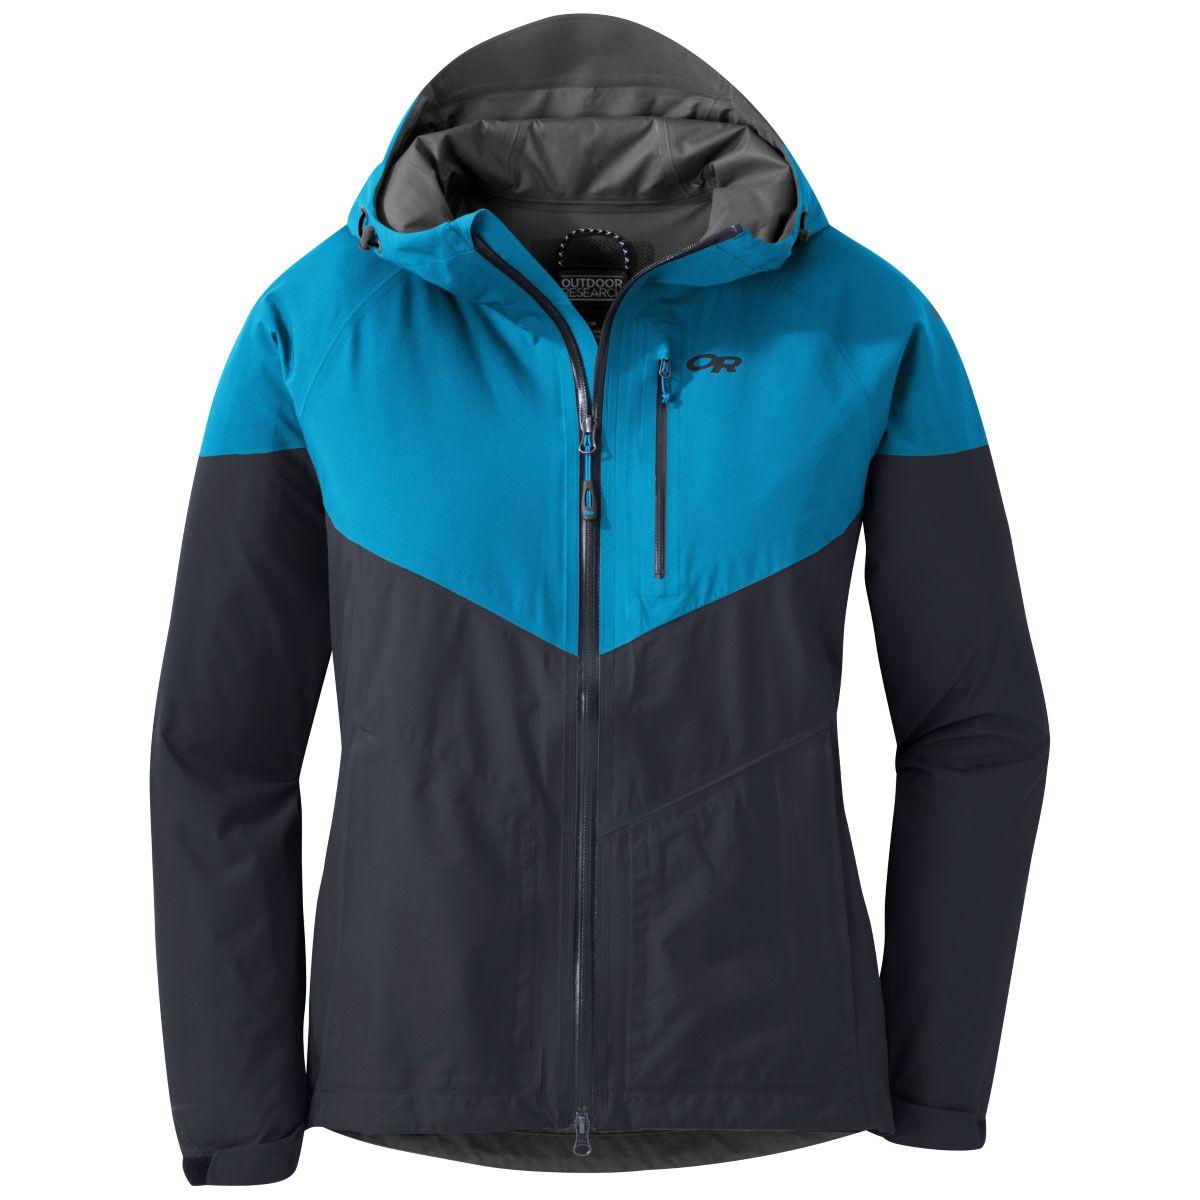 Outdoor Research Aspire Jacket